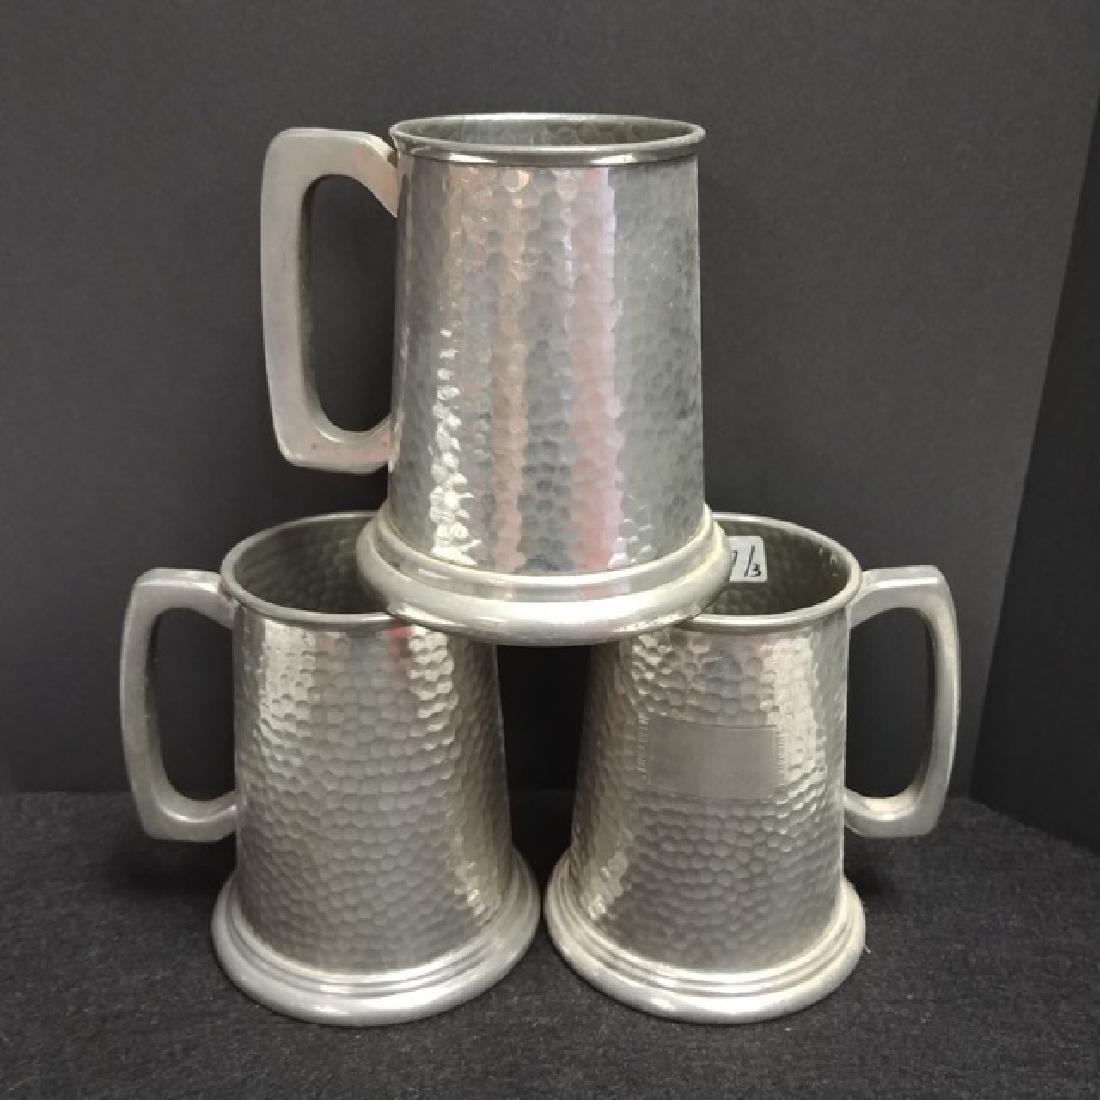 3 Hammered Pewter Mugs